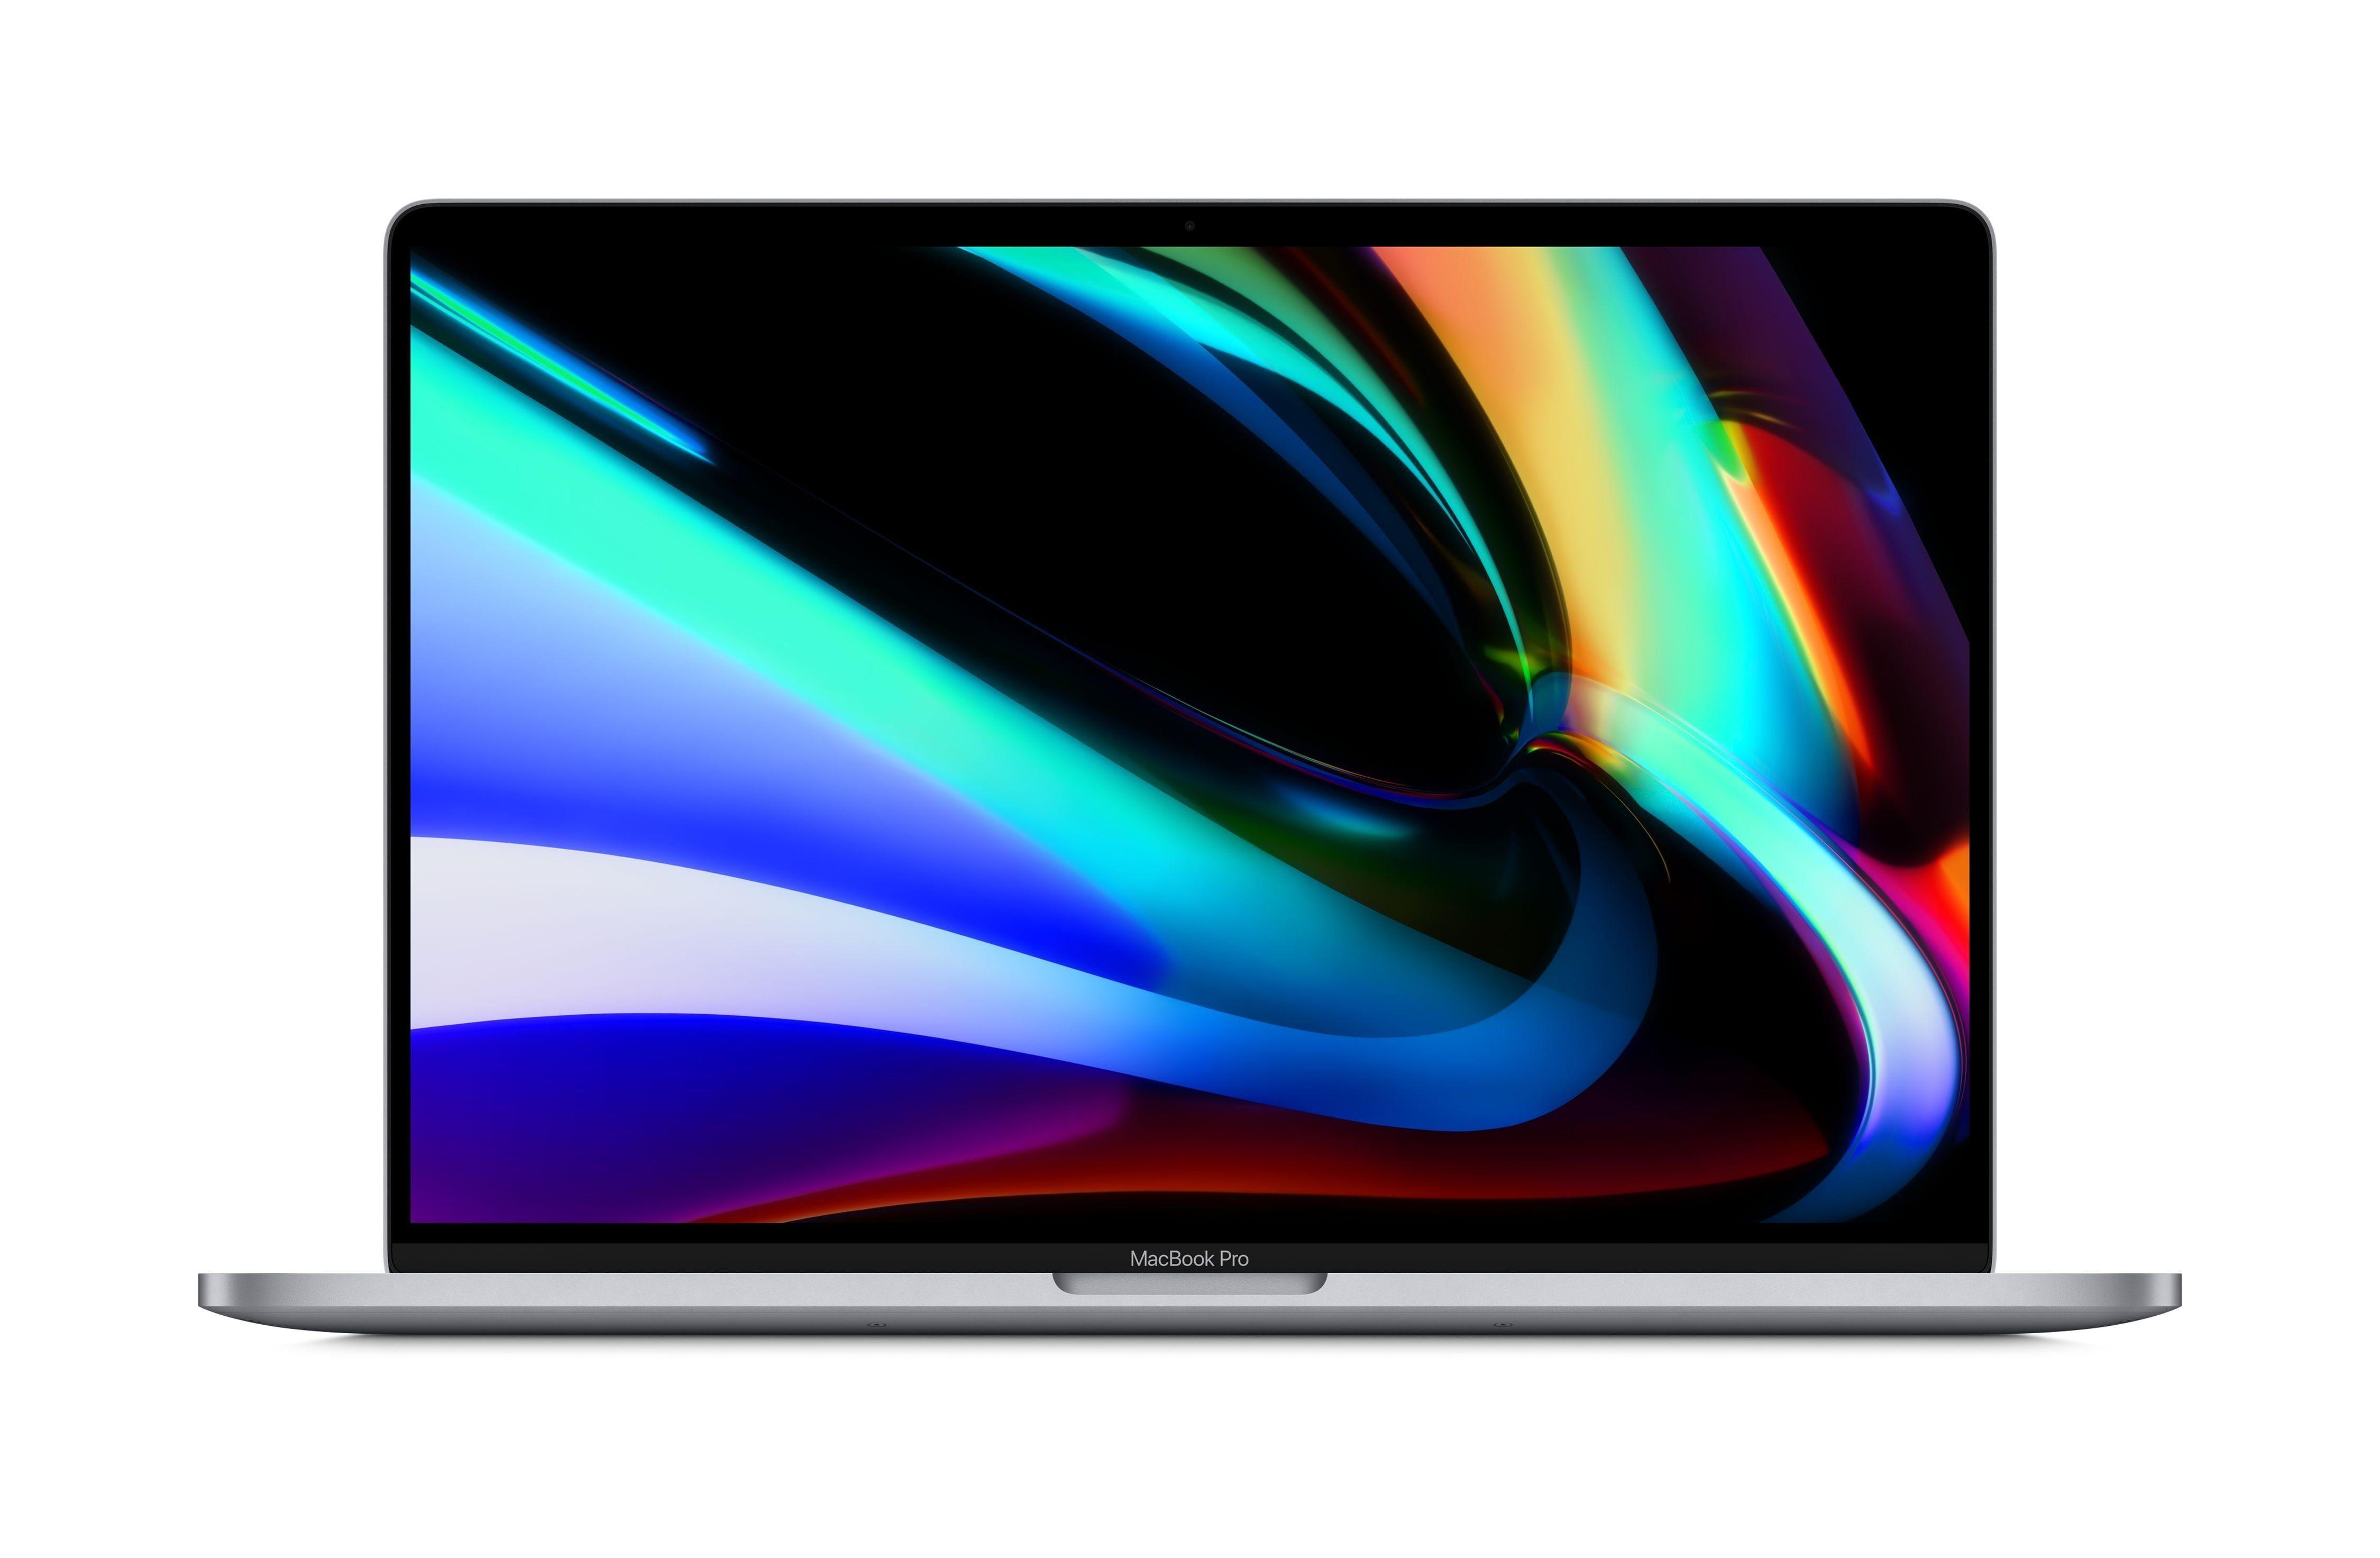 "Apple MacBook Pro 16"" Retina »40,6 cm (16) Intel Core, SSD, DDR4 SDRAM«, Space Grau"